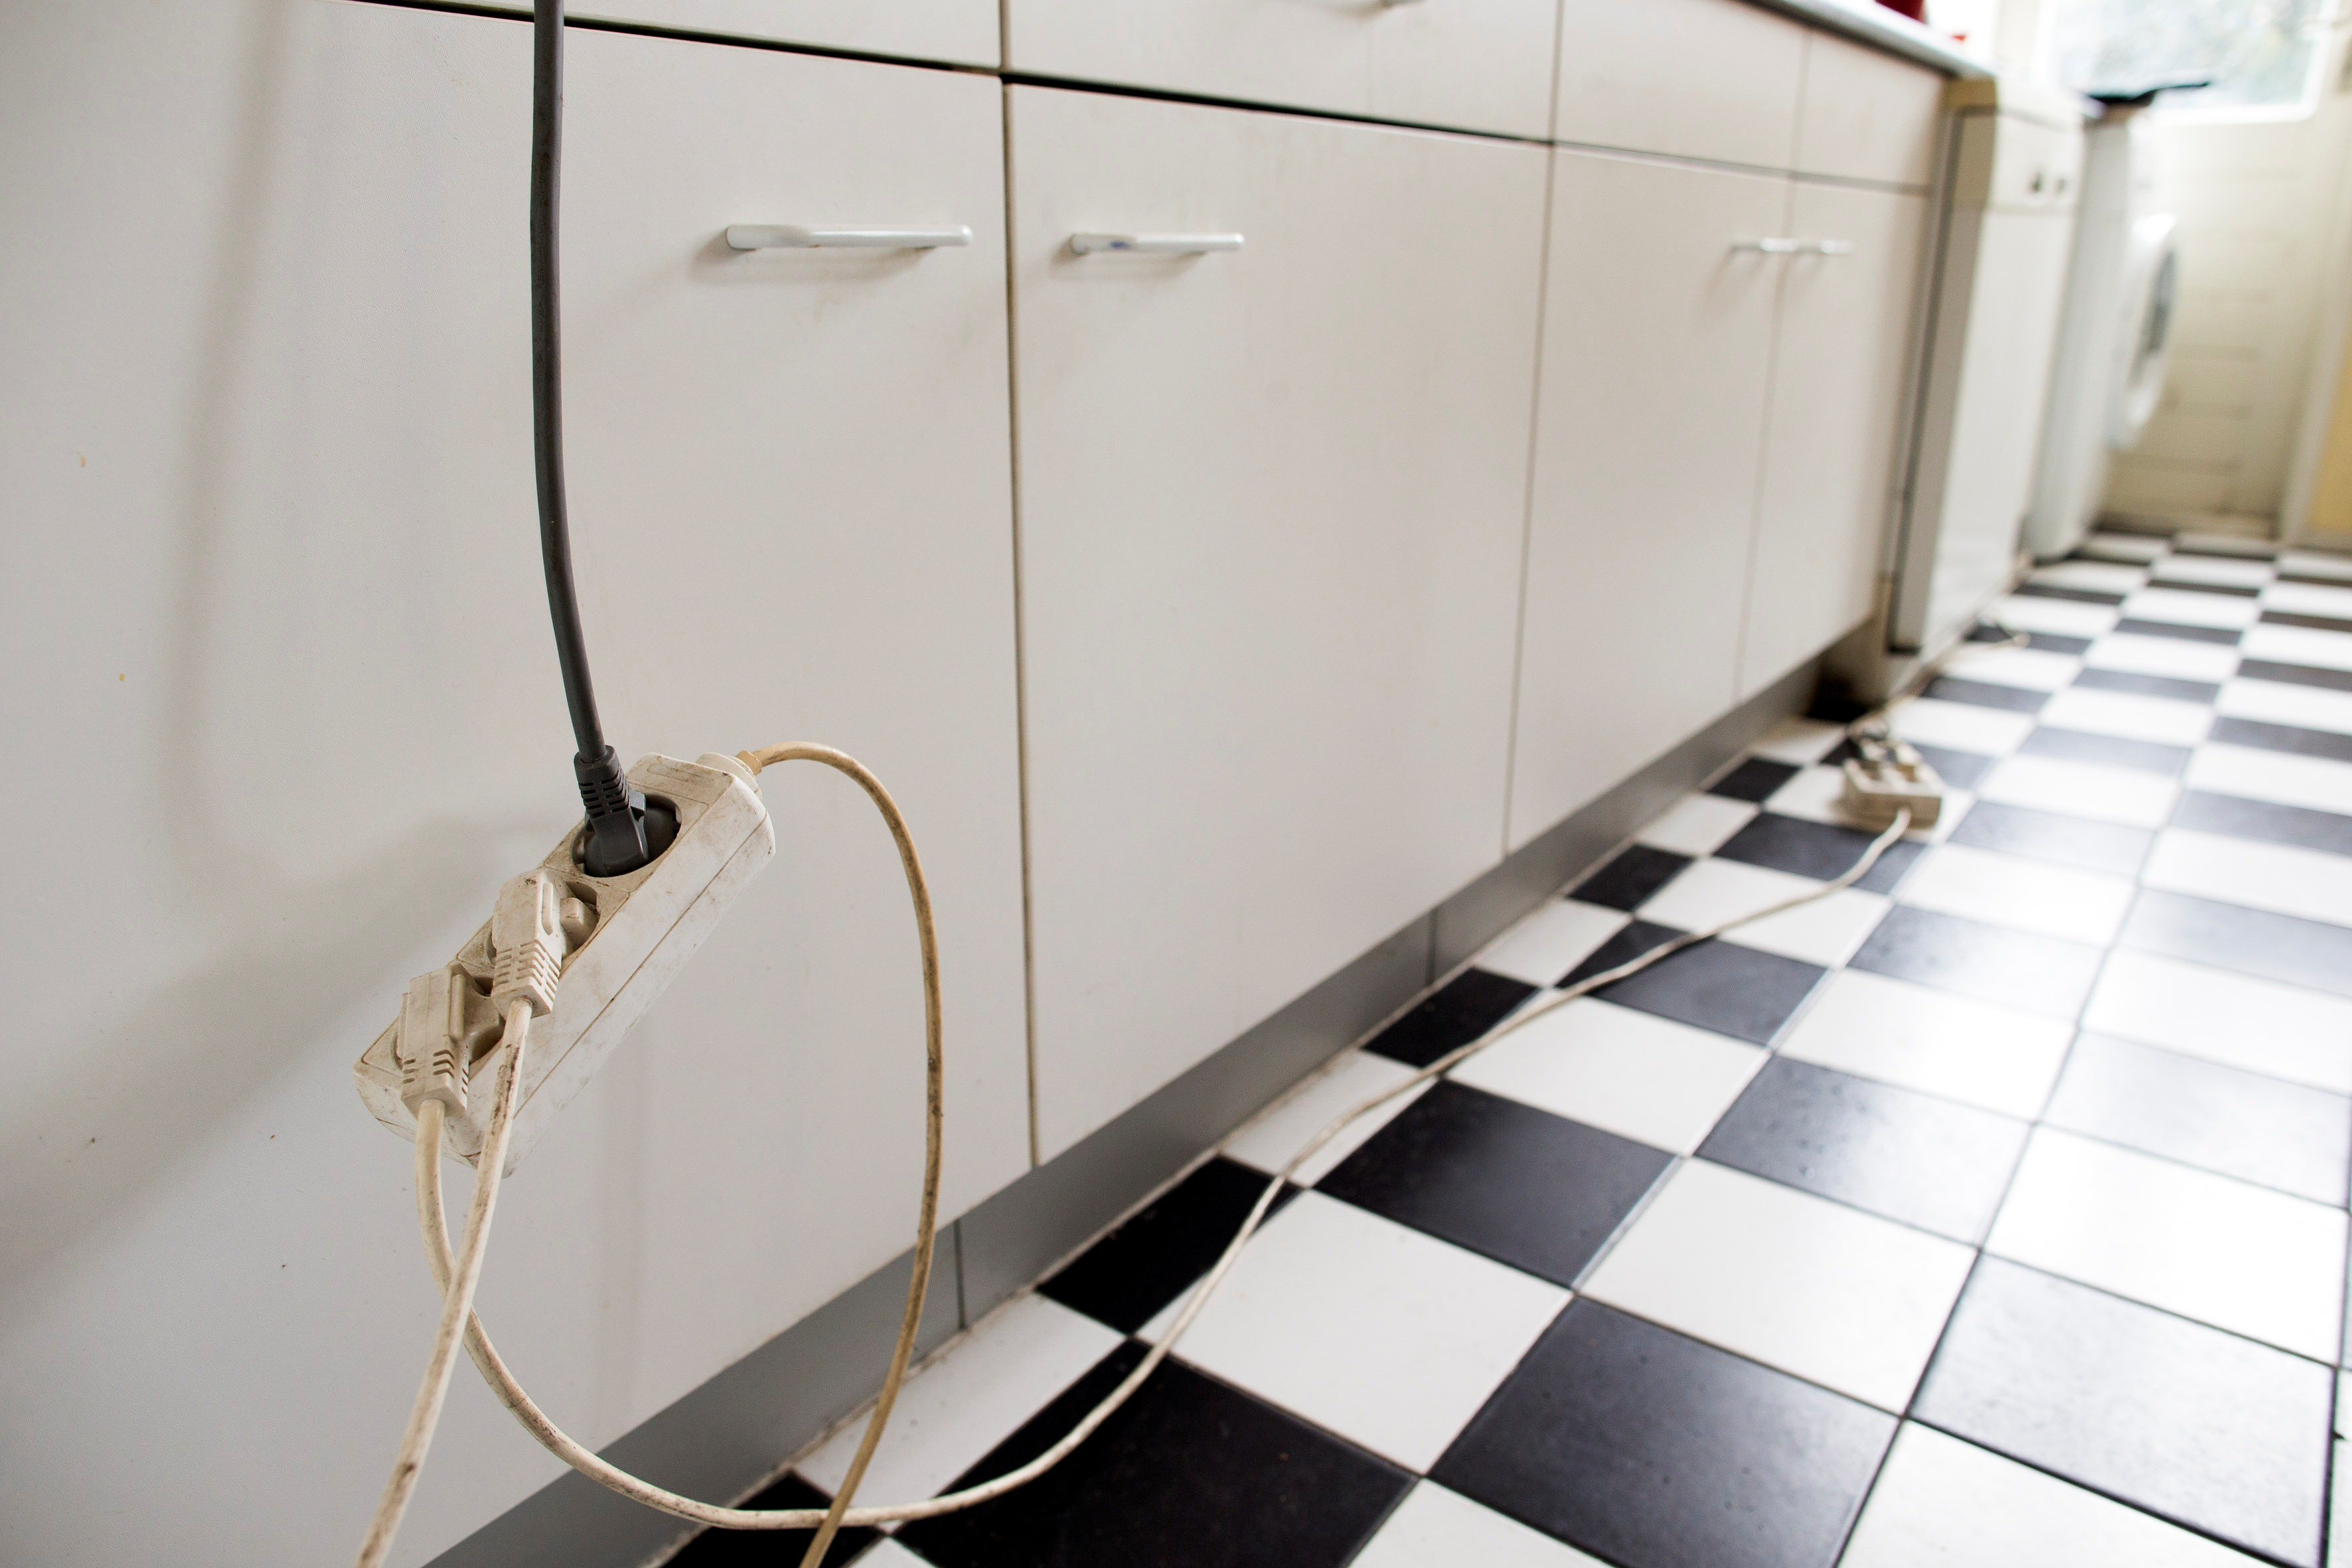 studentenhuis brandveiligheid elektriciteit verlengsnoer